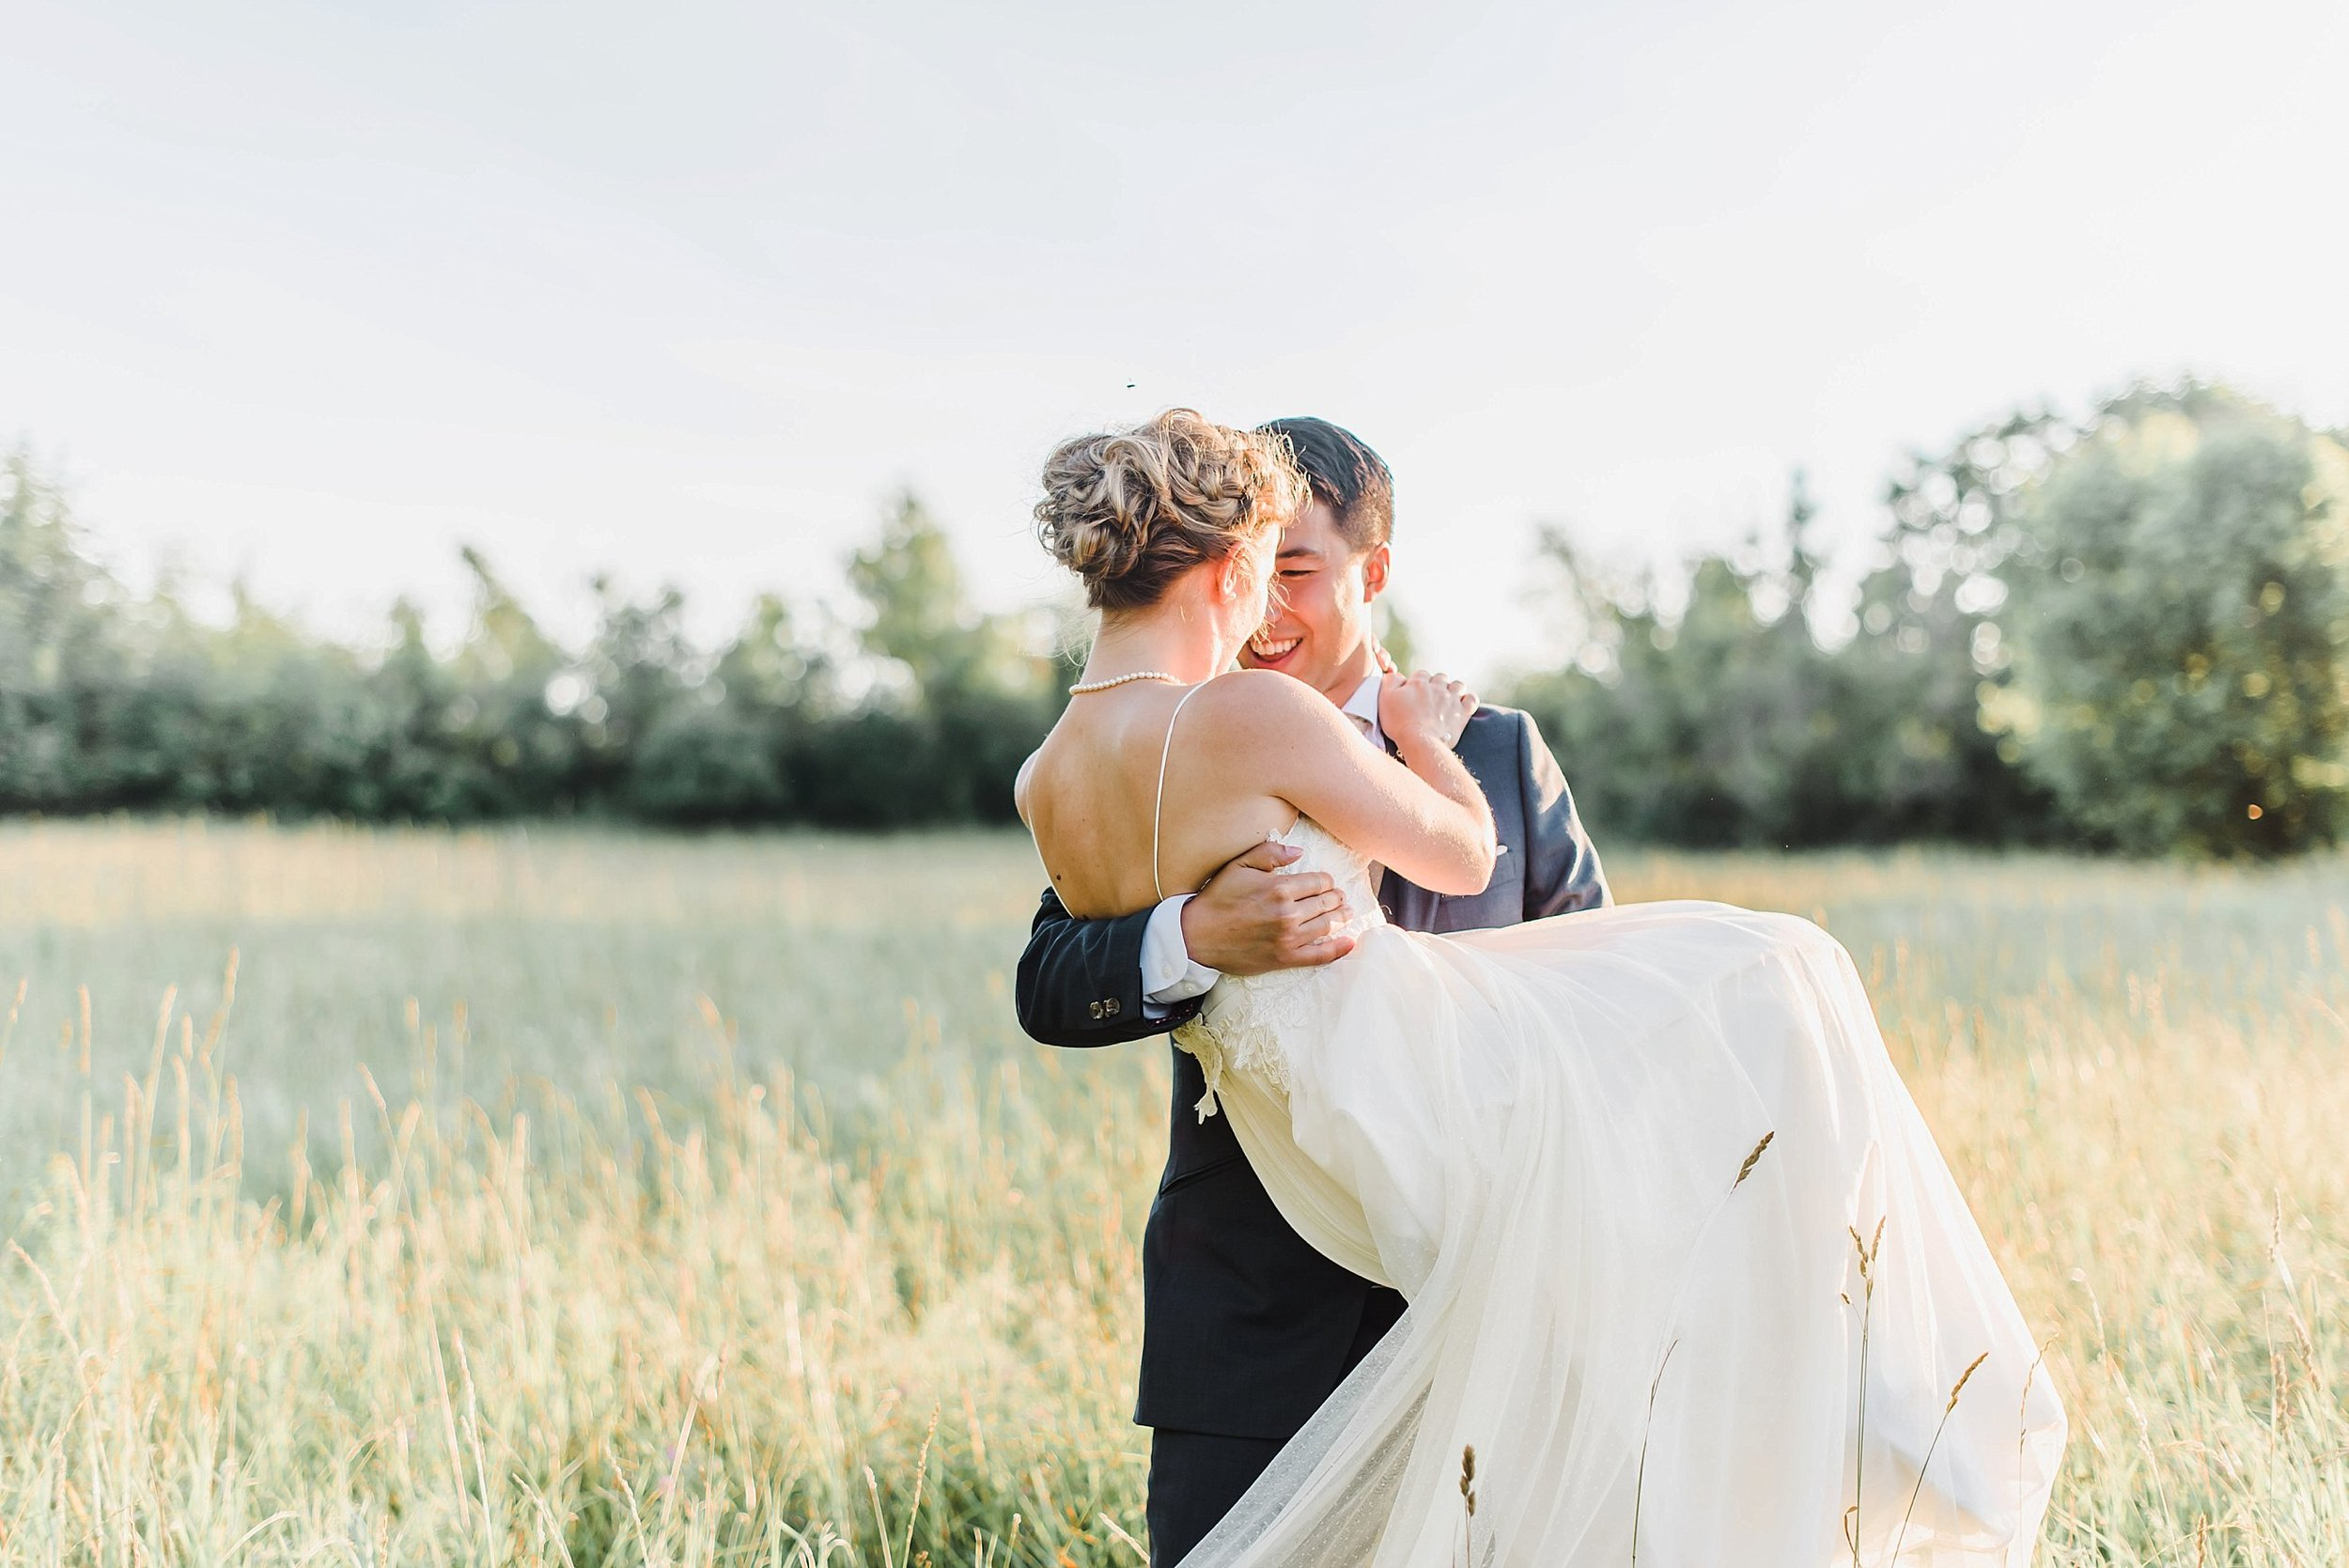 light airy indie fine art ottawa wedding photographer | Ali and Batoul Photography_0903.jpg